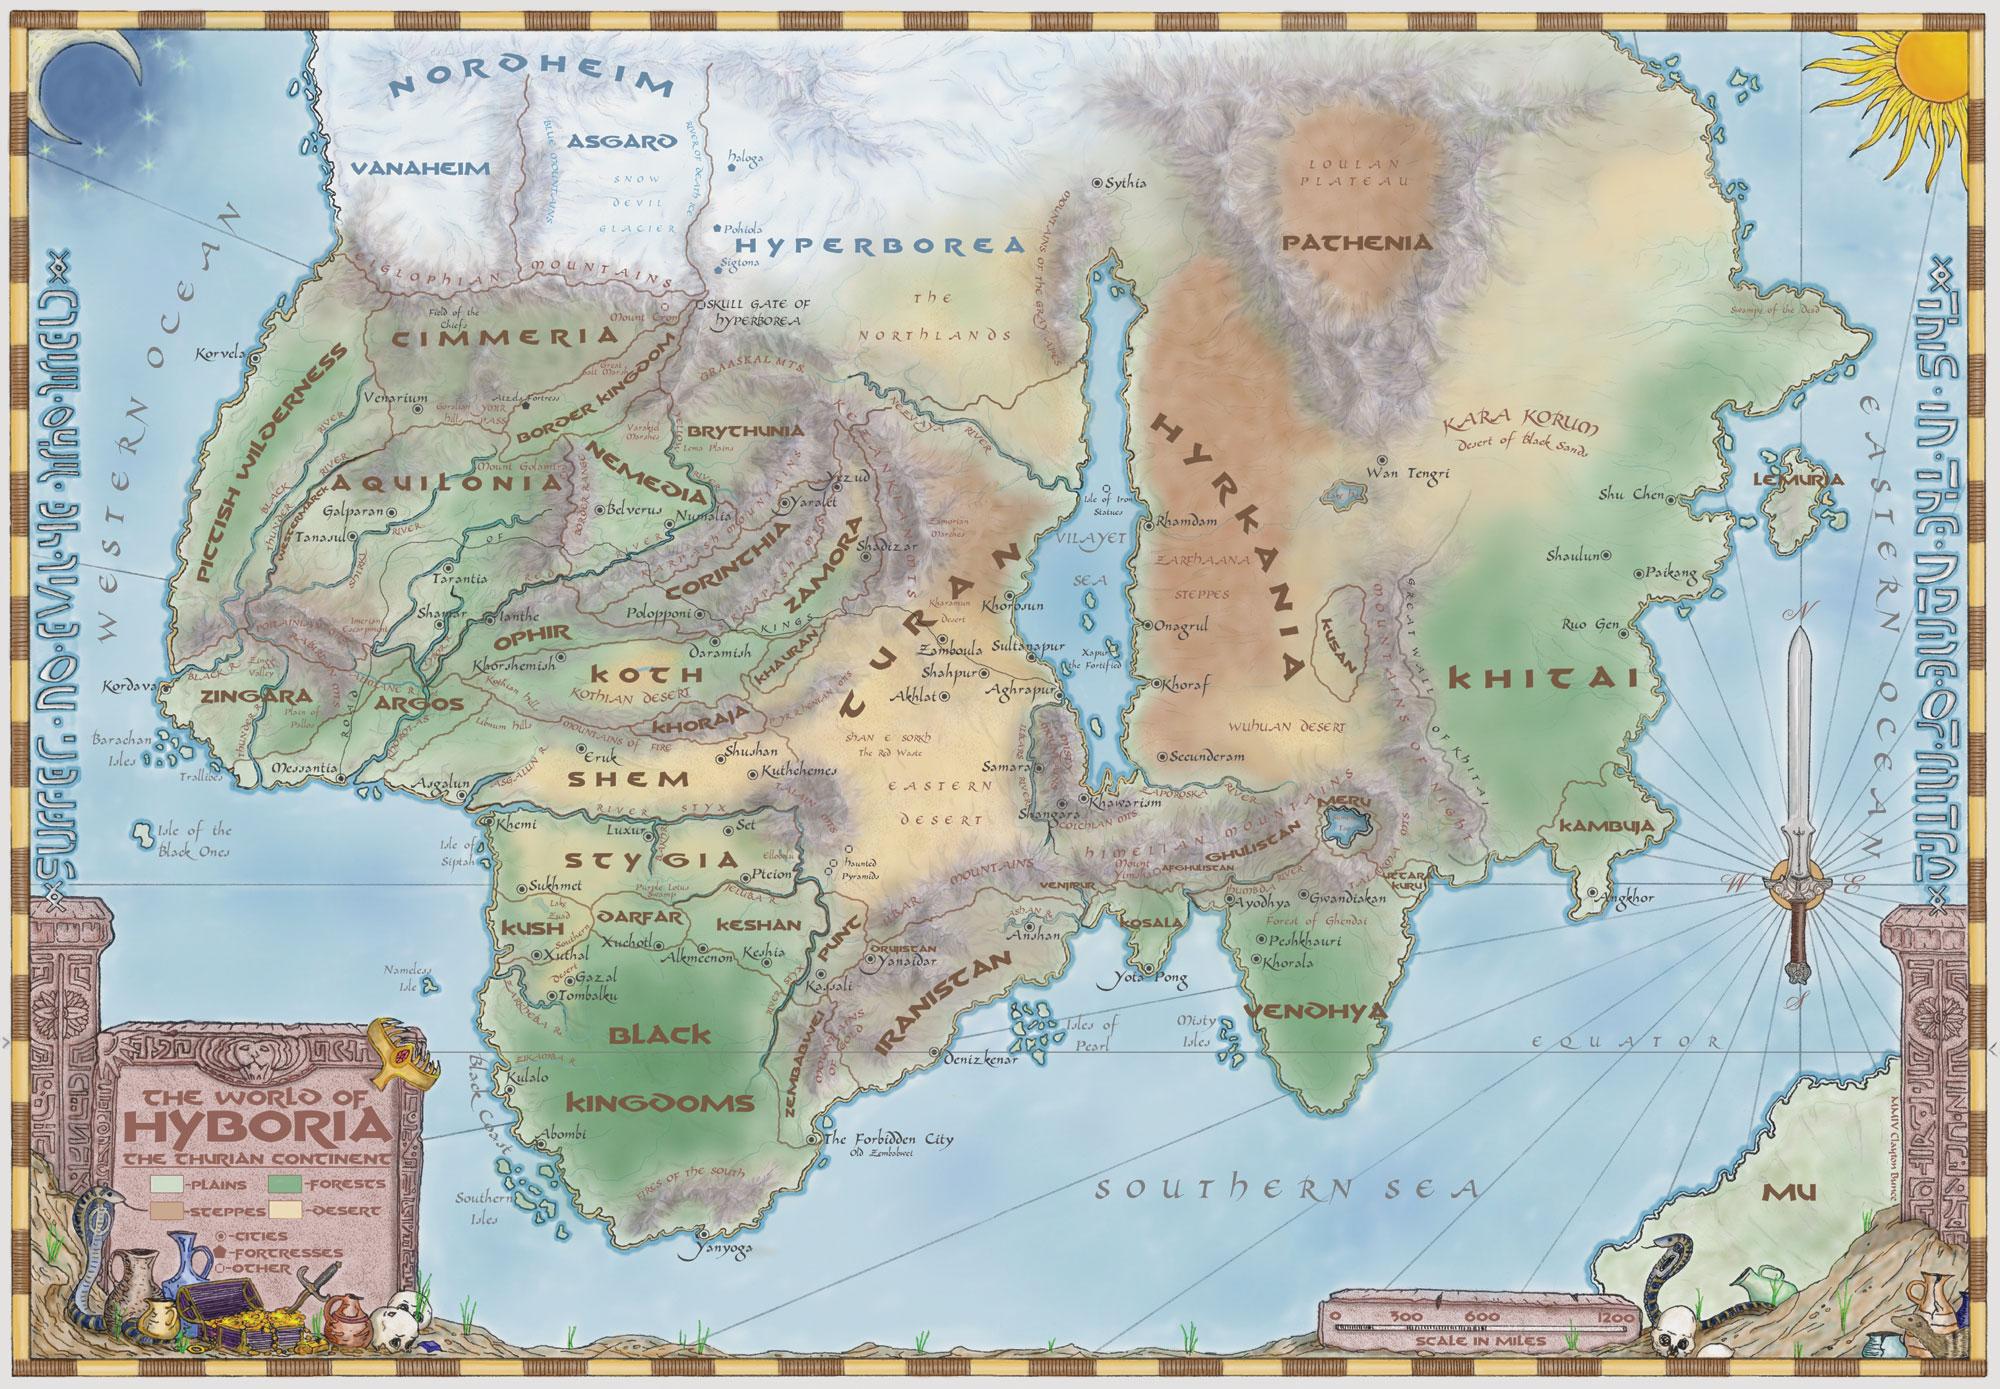 Map of the hyborian age